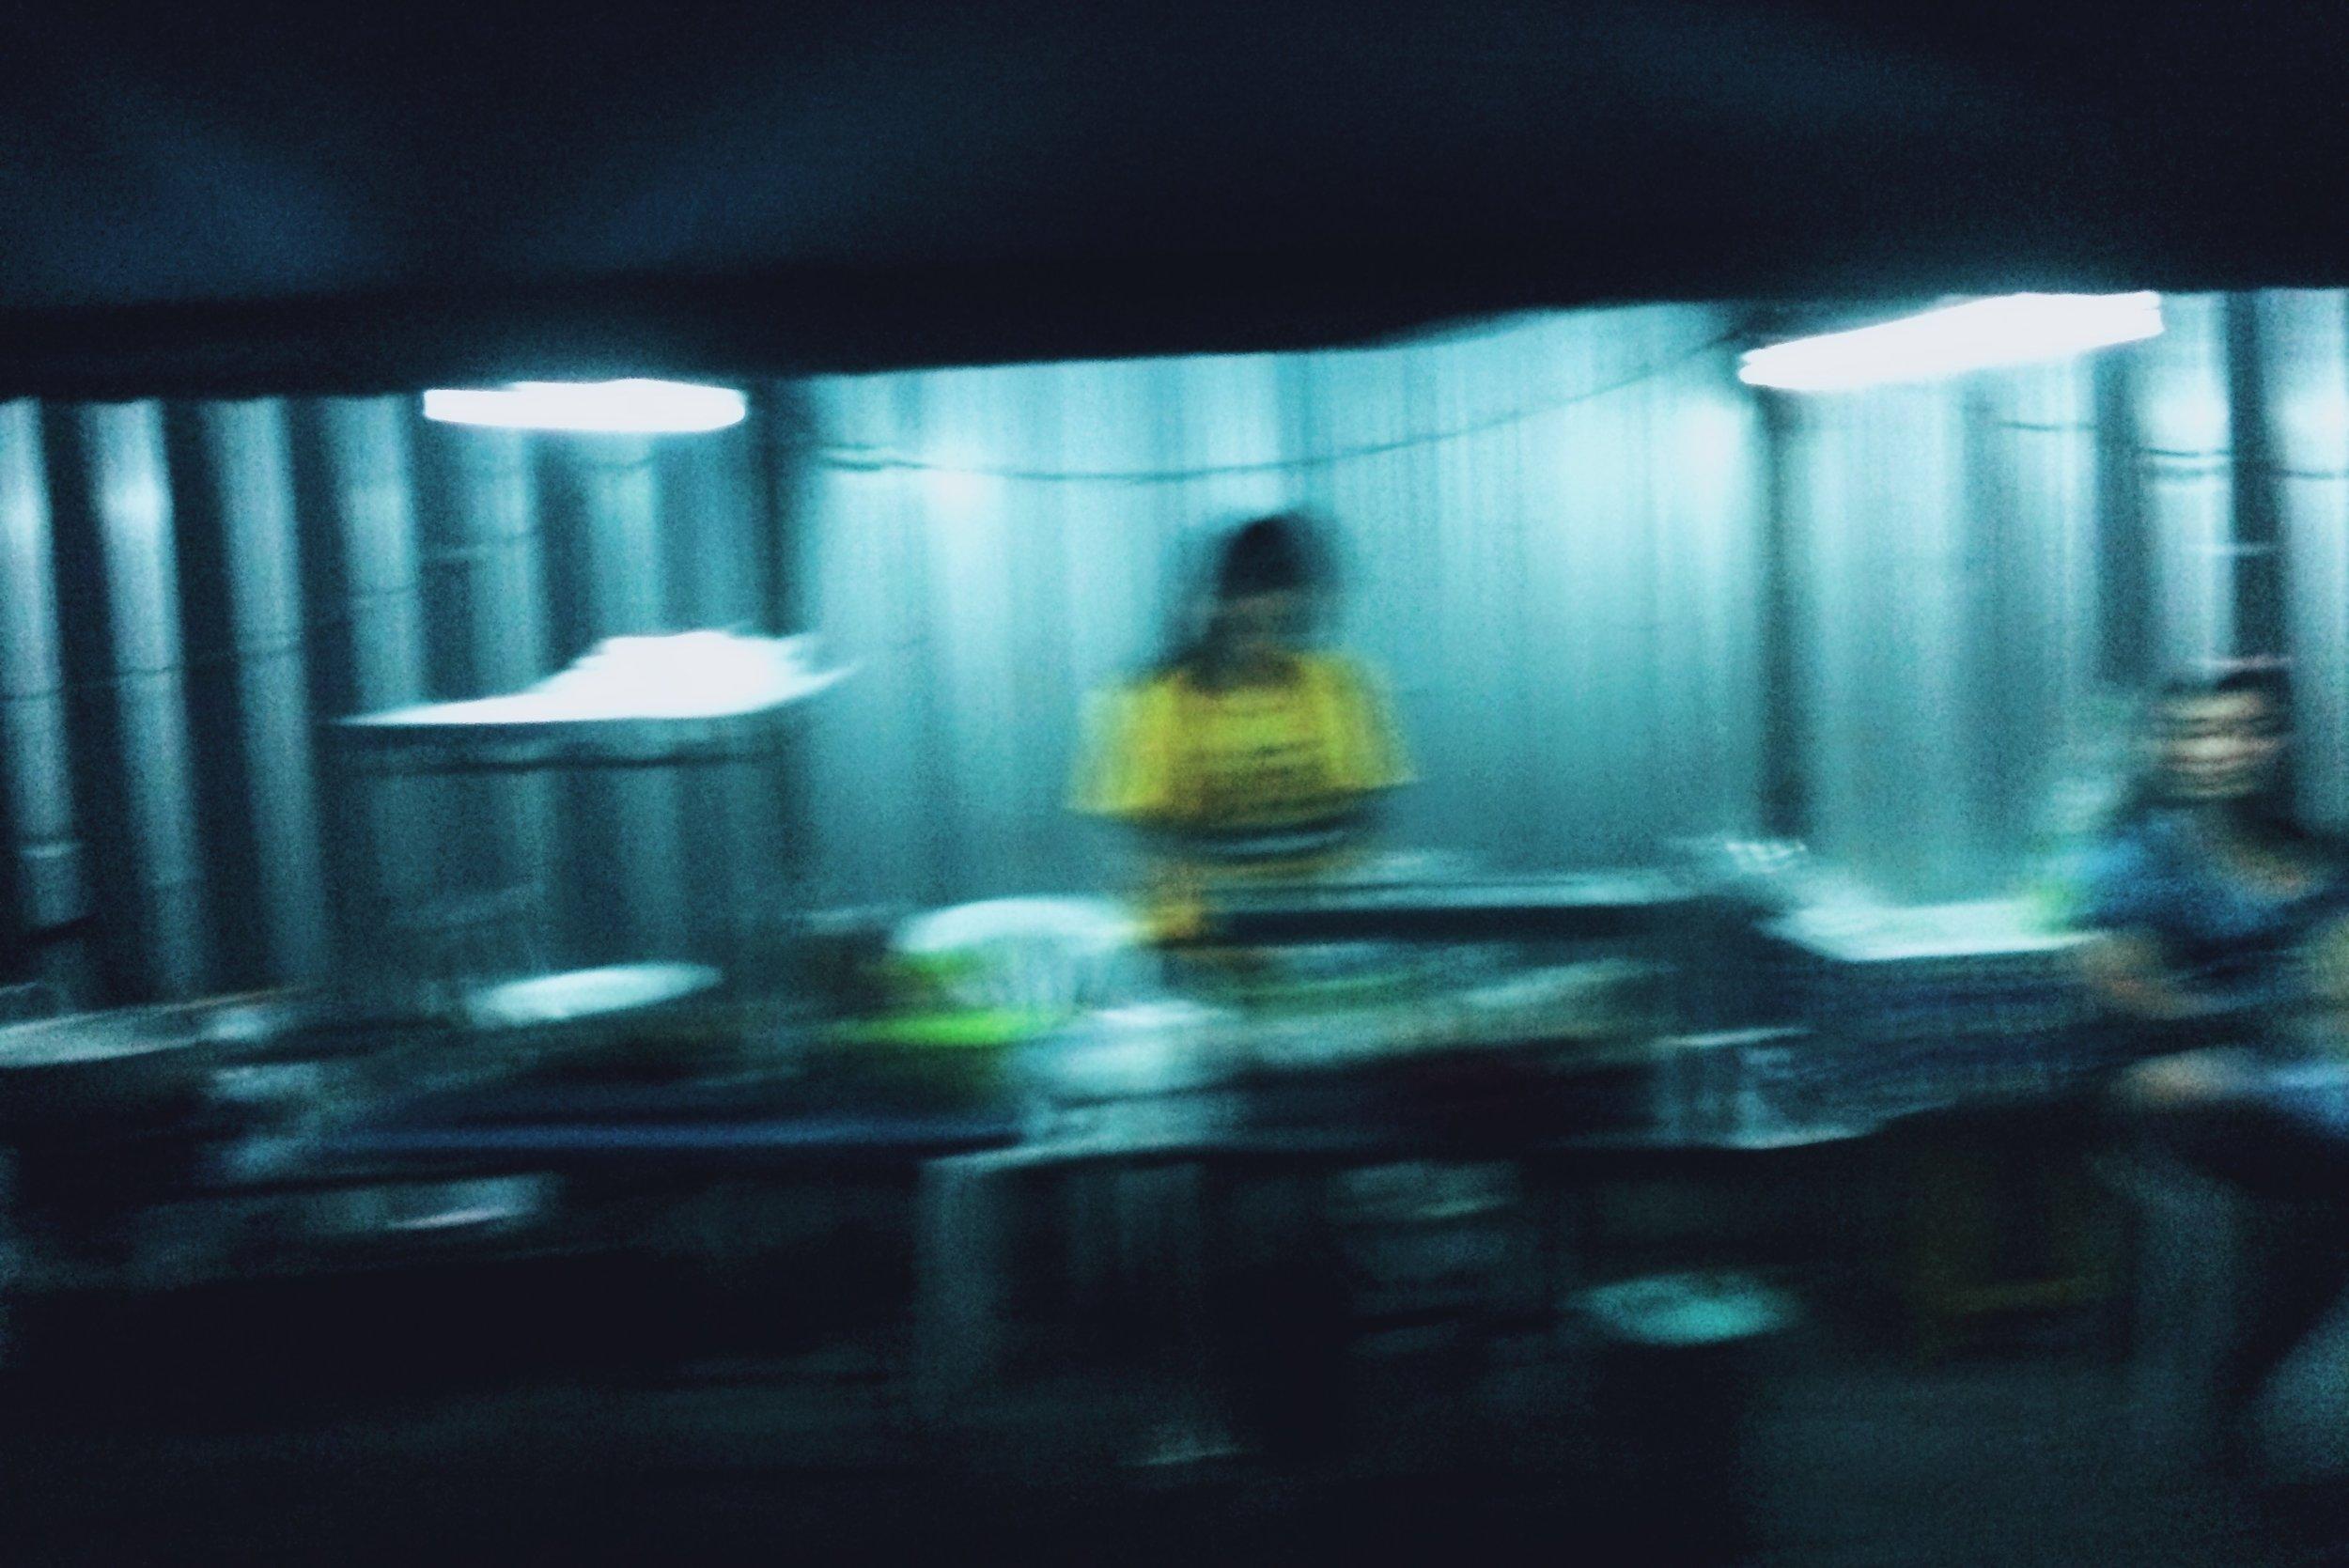 Photo 2015-10-07, 19 21 29.jpg